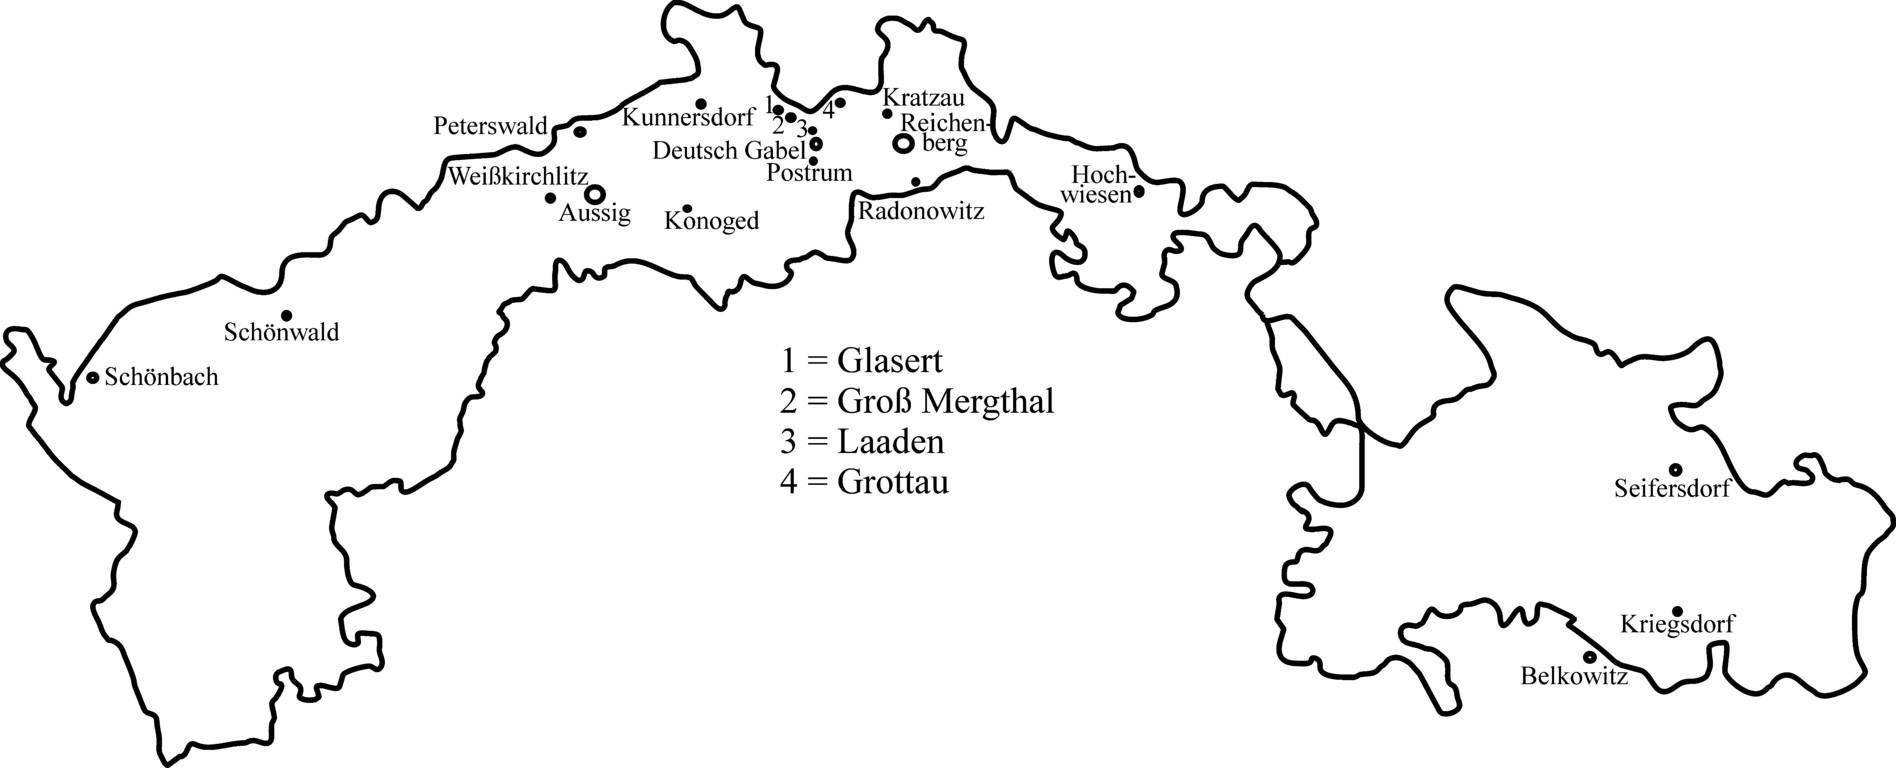 Das Sudentenland (1938)